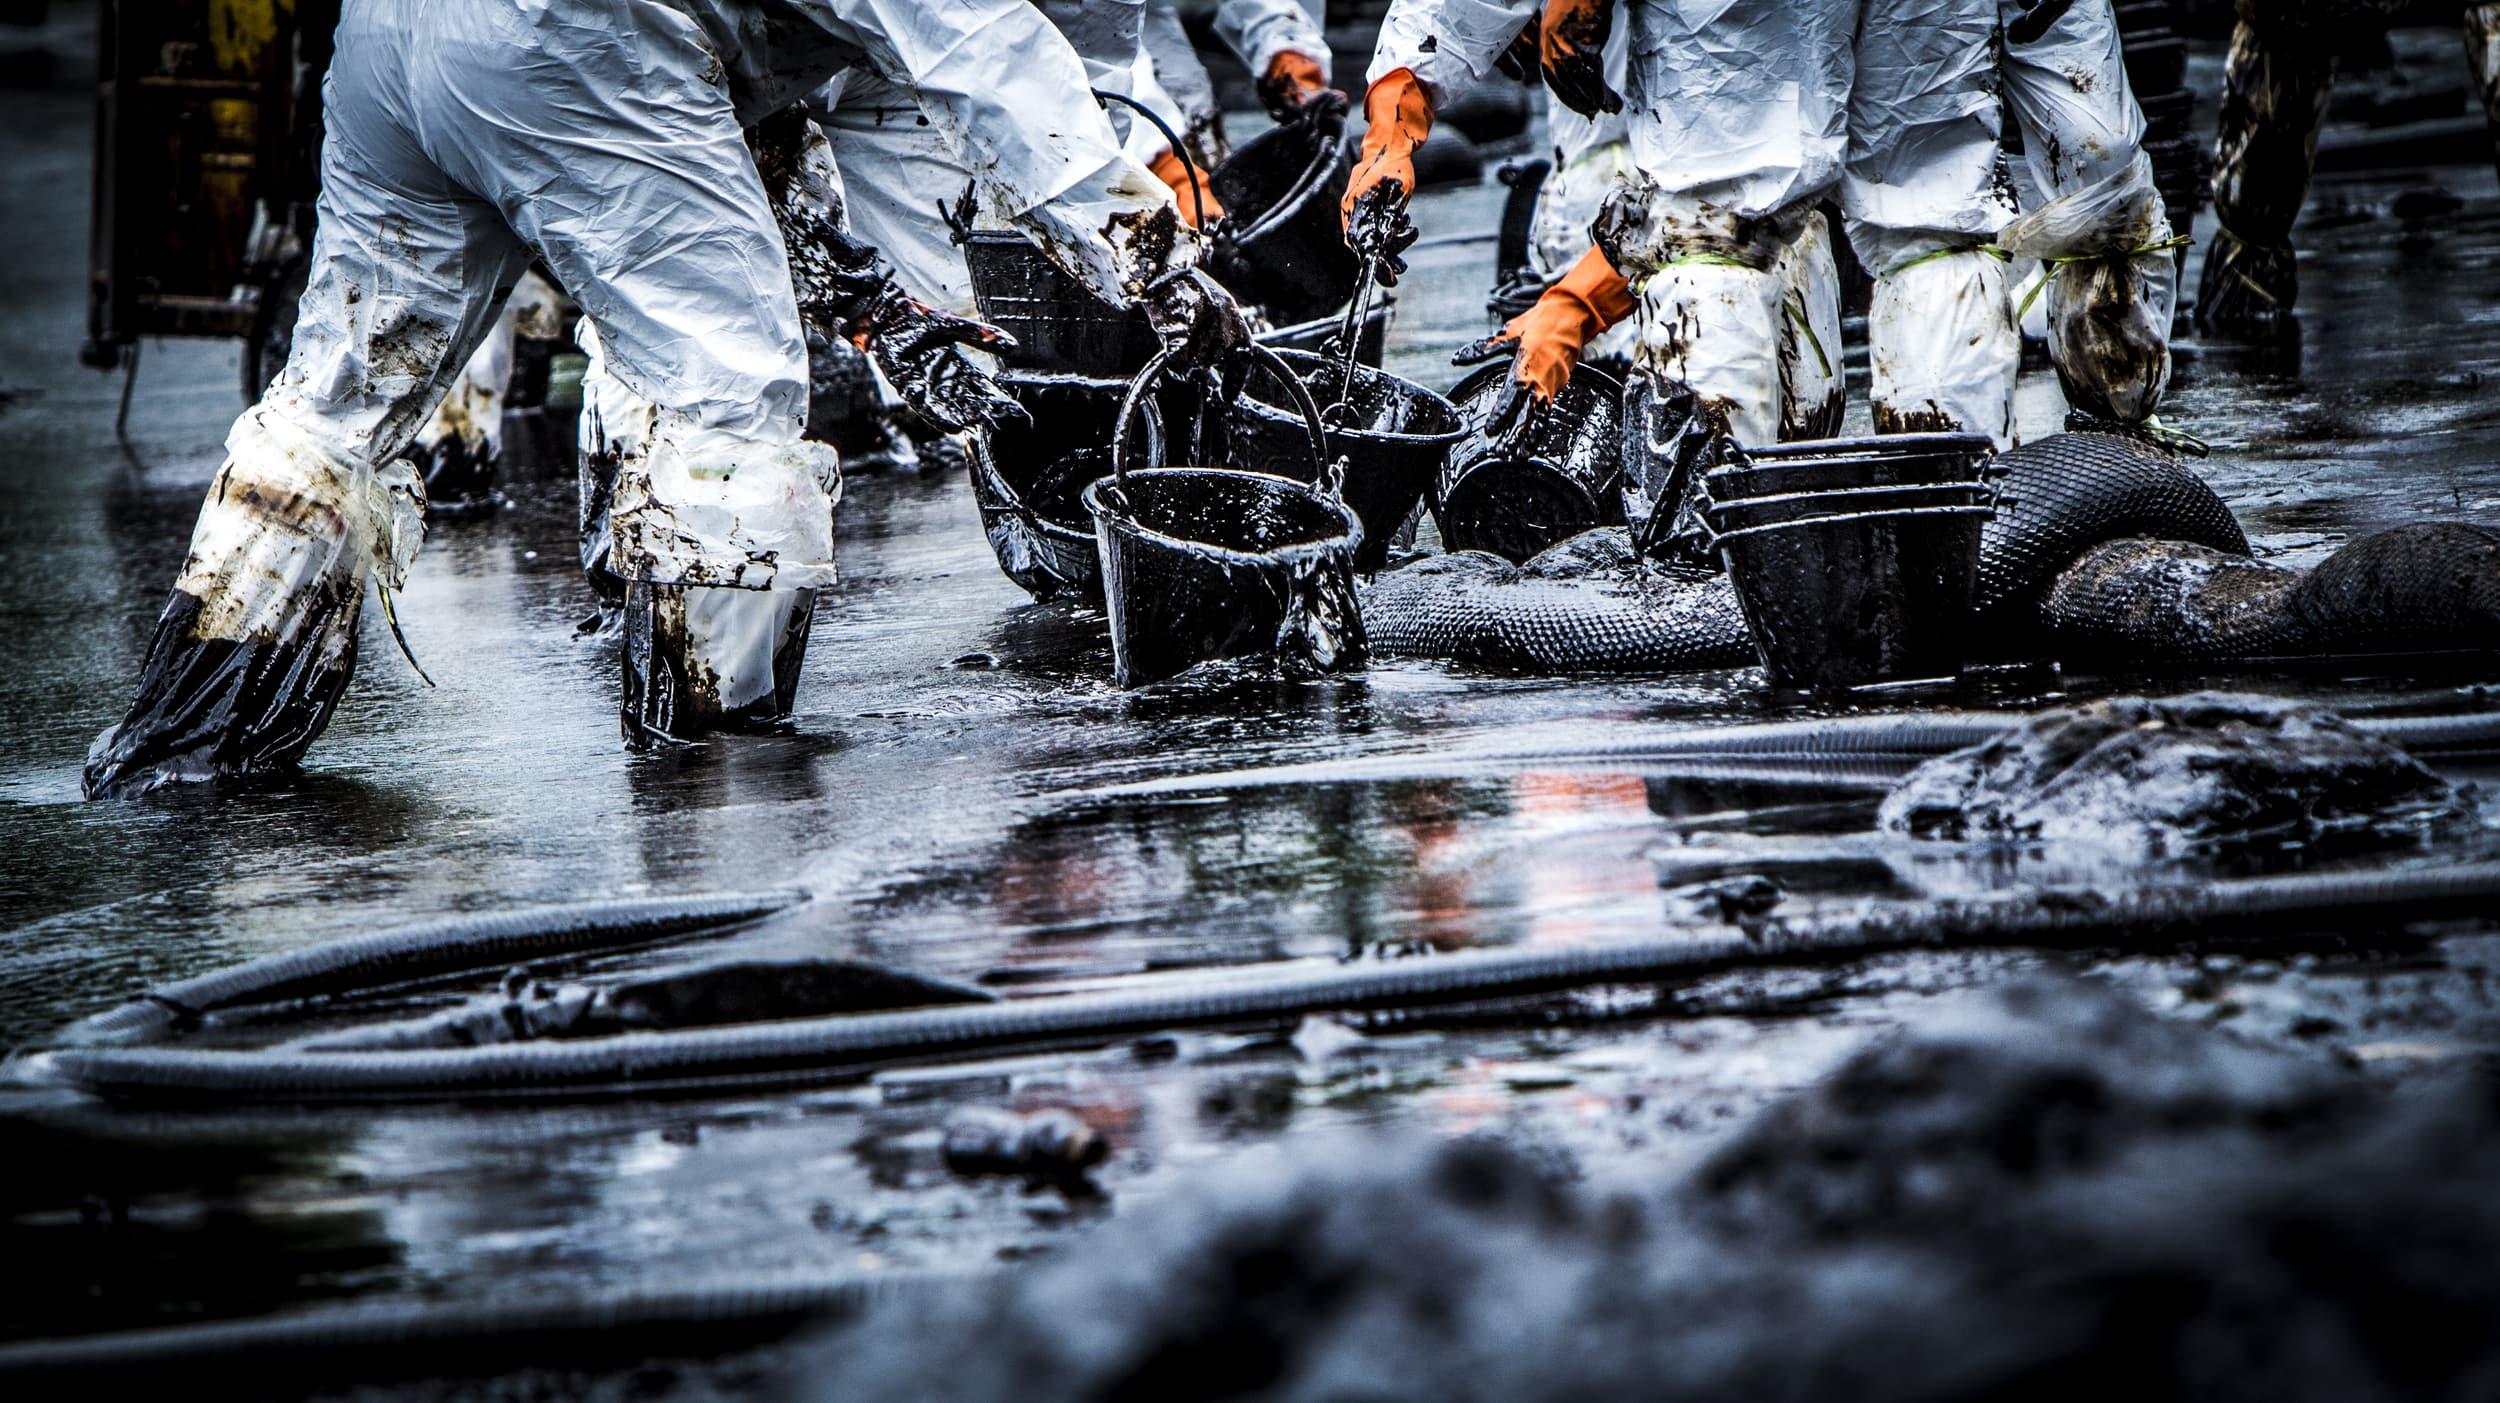 Compliance Training Online Crude Oil Hazards course